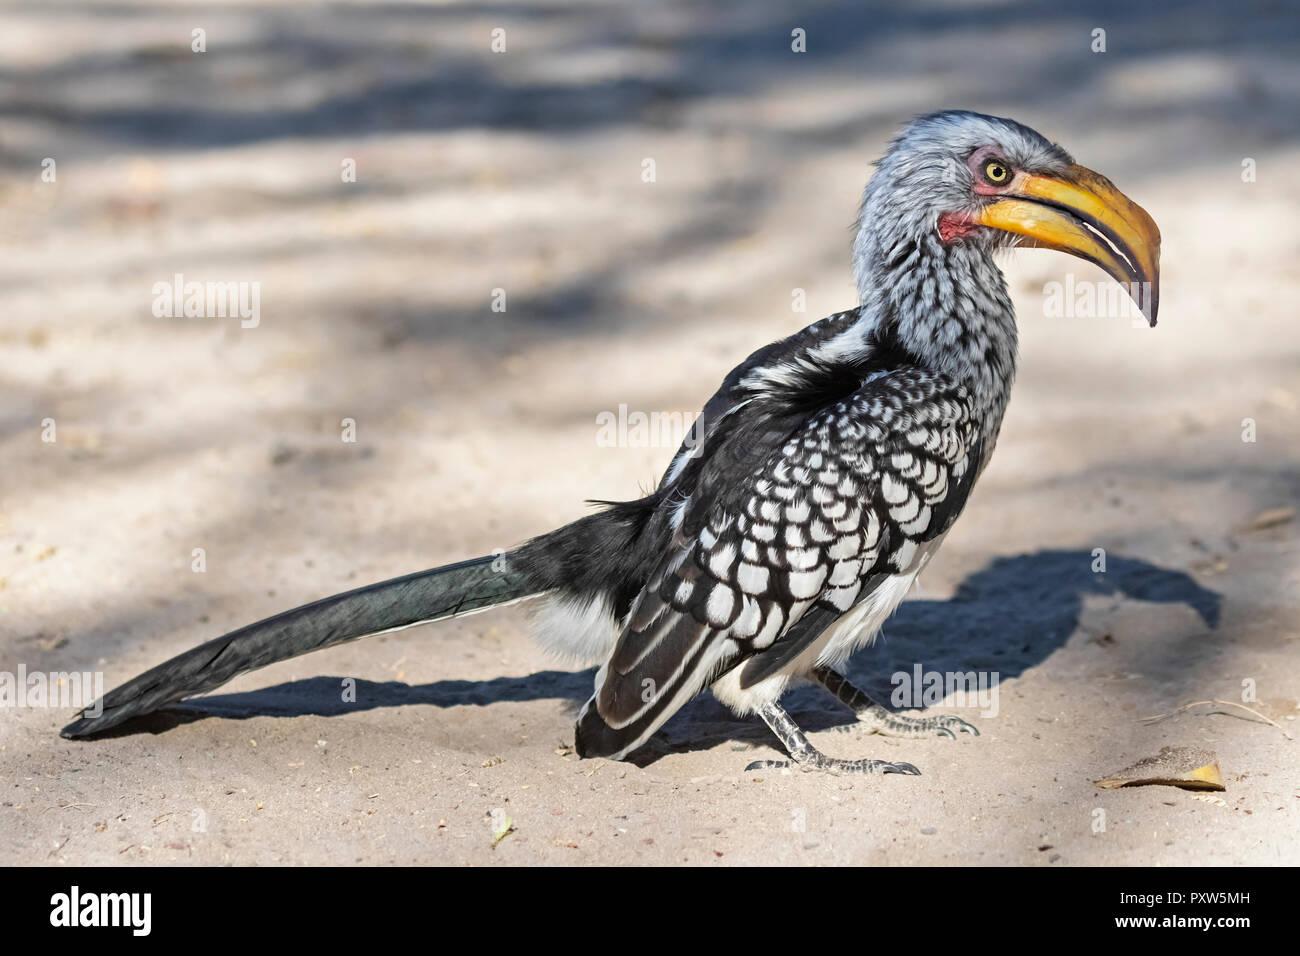 Botswana, Kalahari, Central Kalahari Game Reserve, Yellow-billed hornbill, Tockus flavirostris - Stock Image